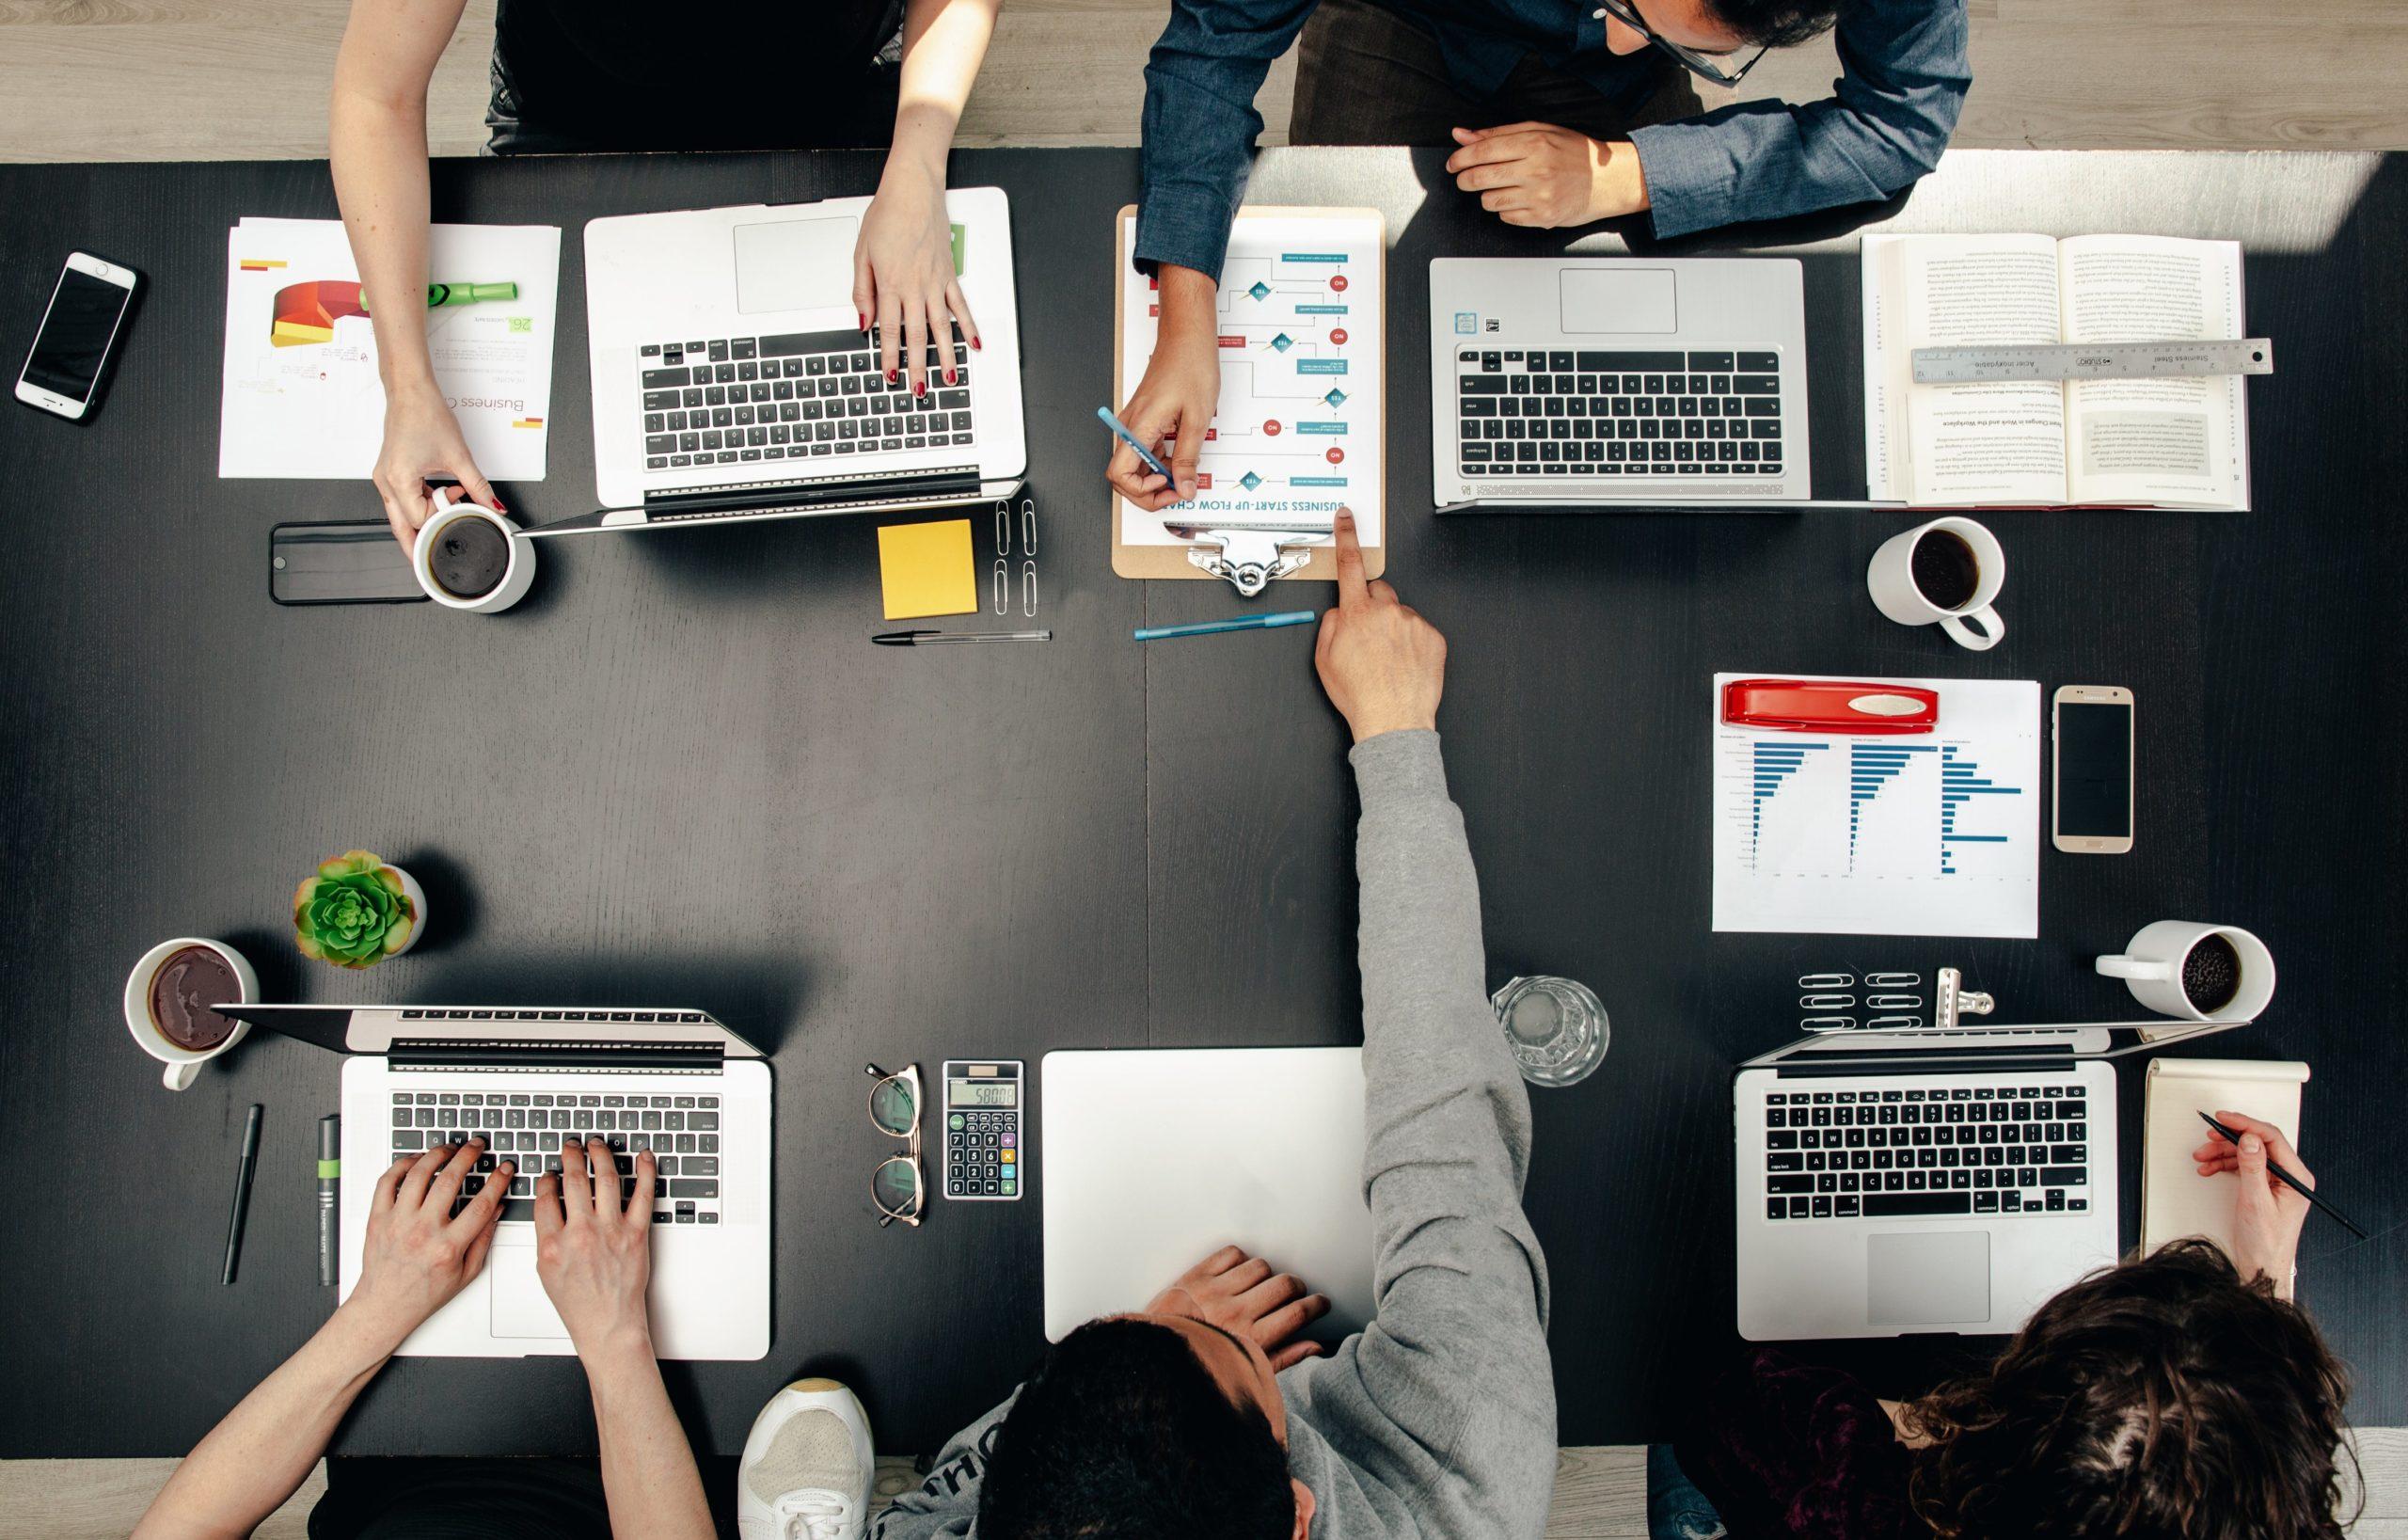 tech-group-meeting-flatlay